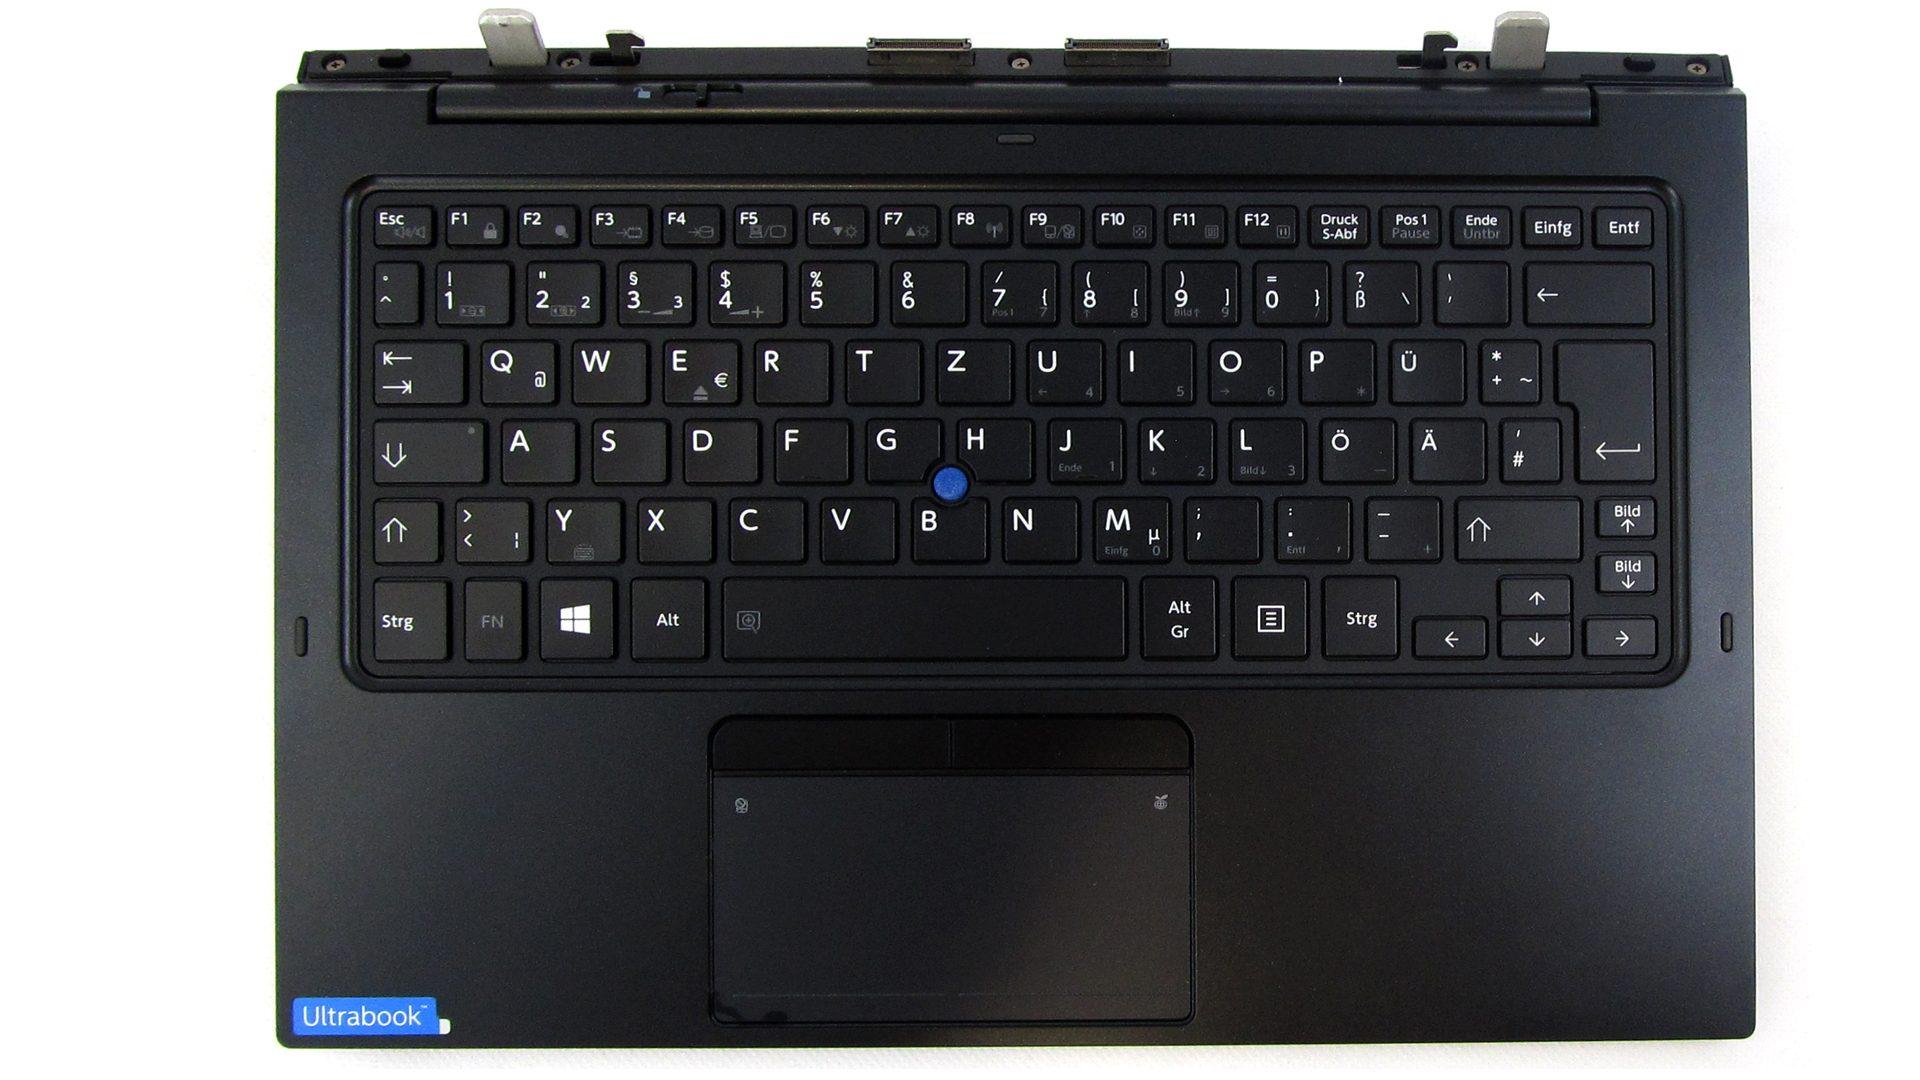 TOSHIBA-Portégé-Z20t-C-144–Tastatur_3